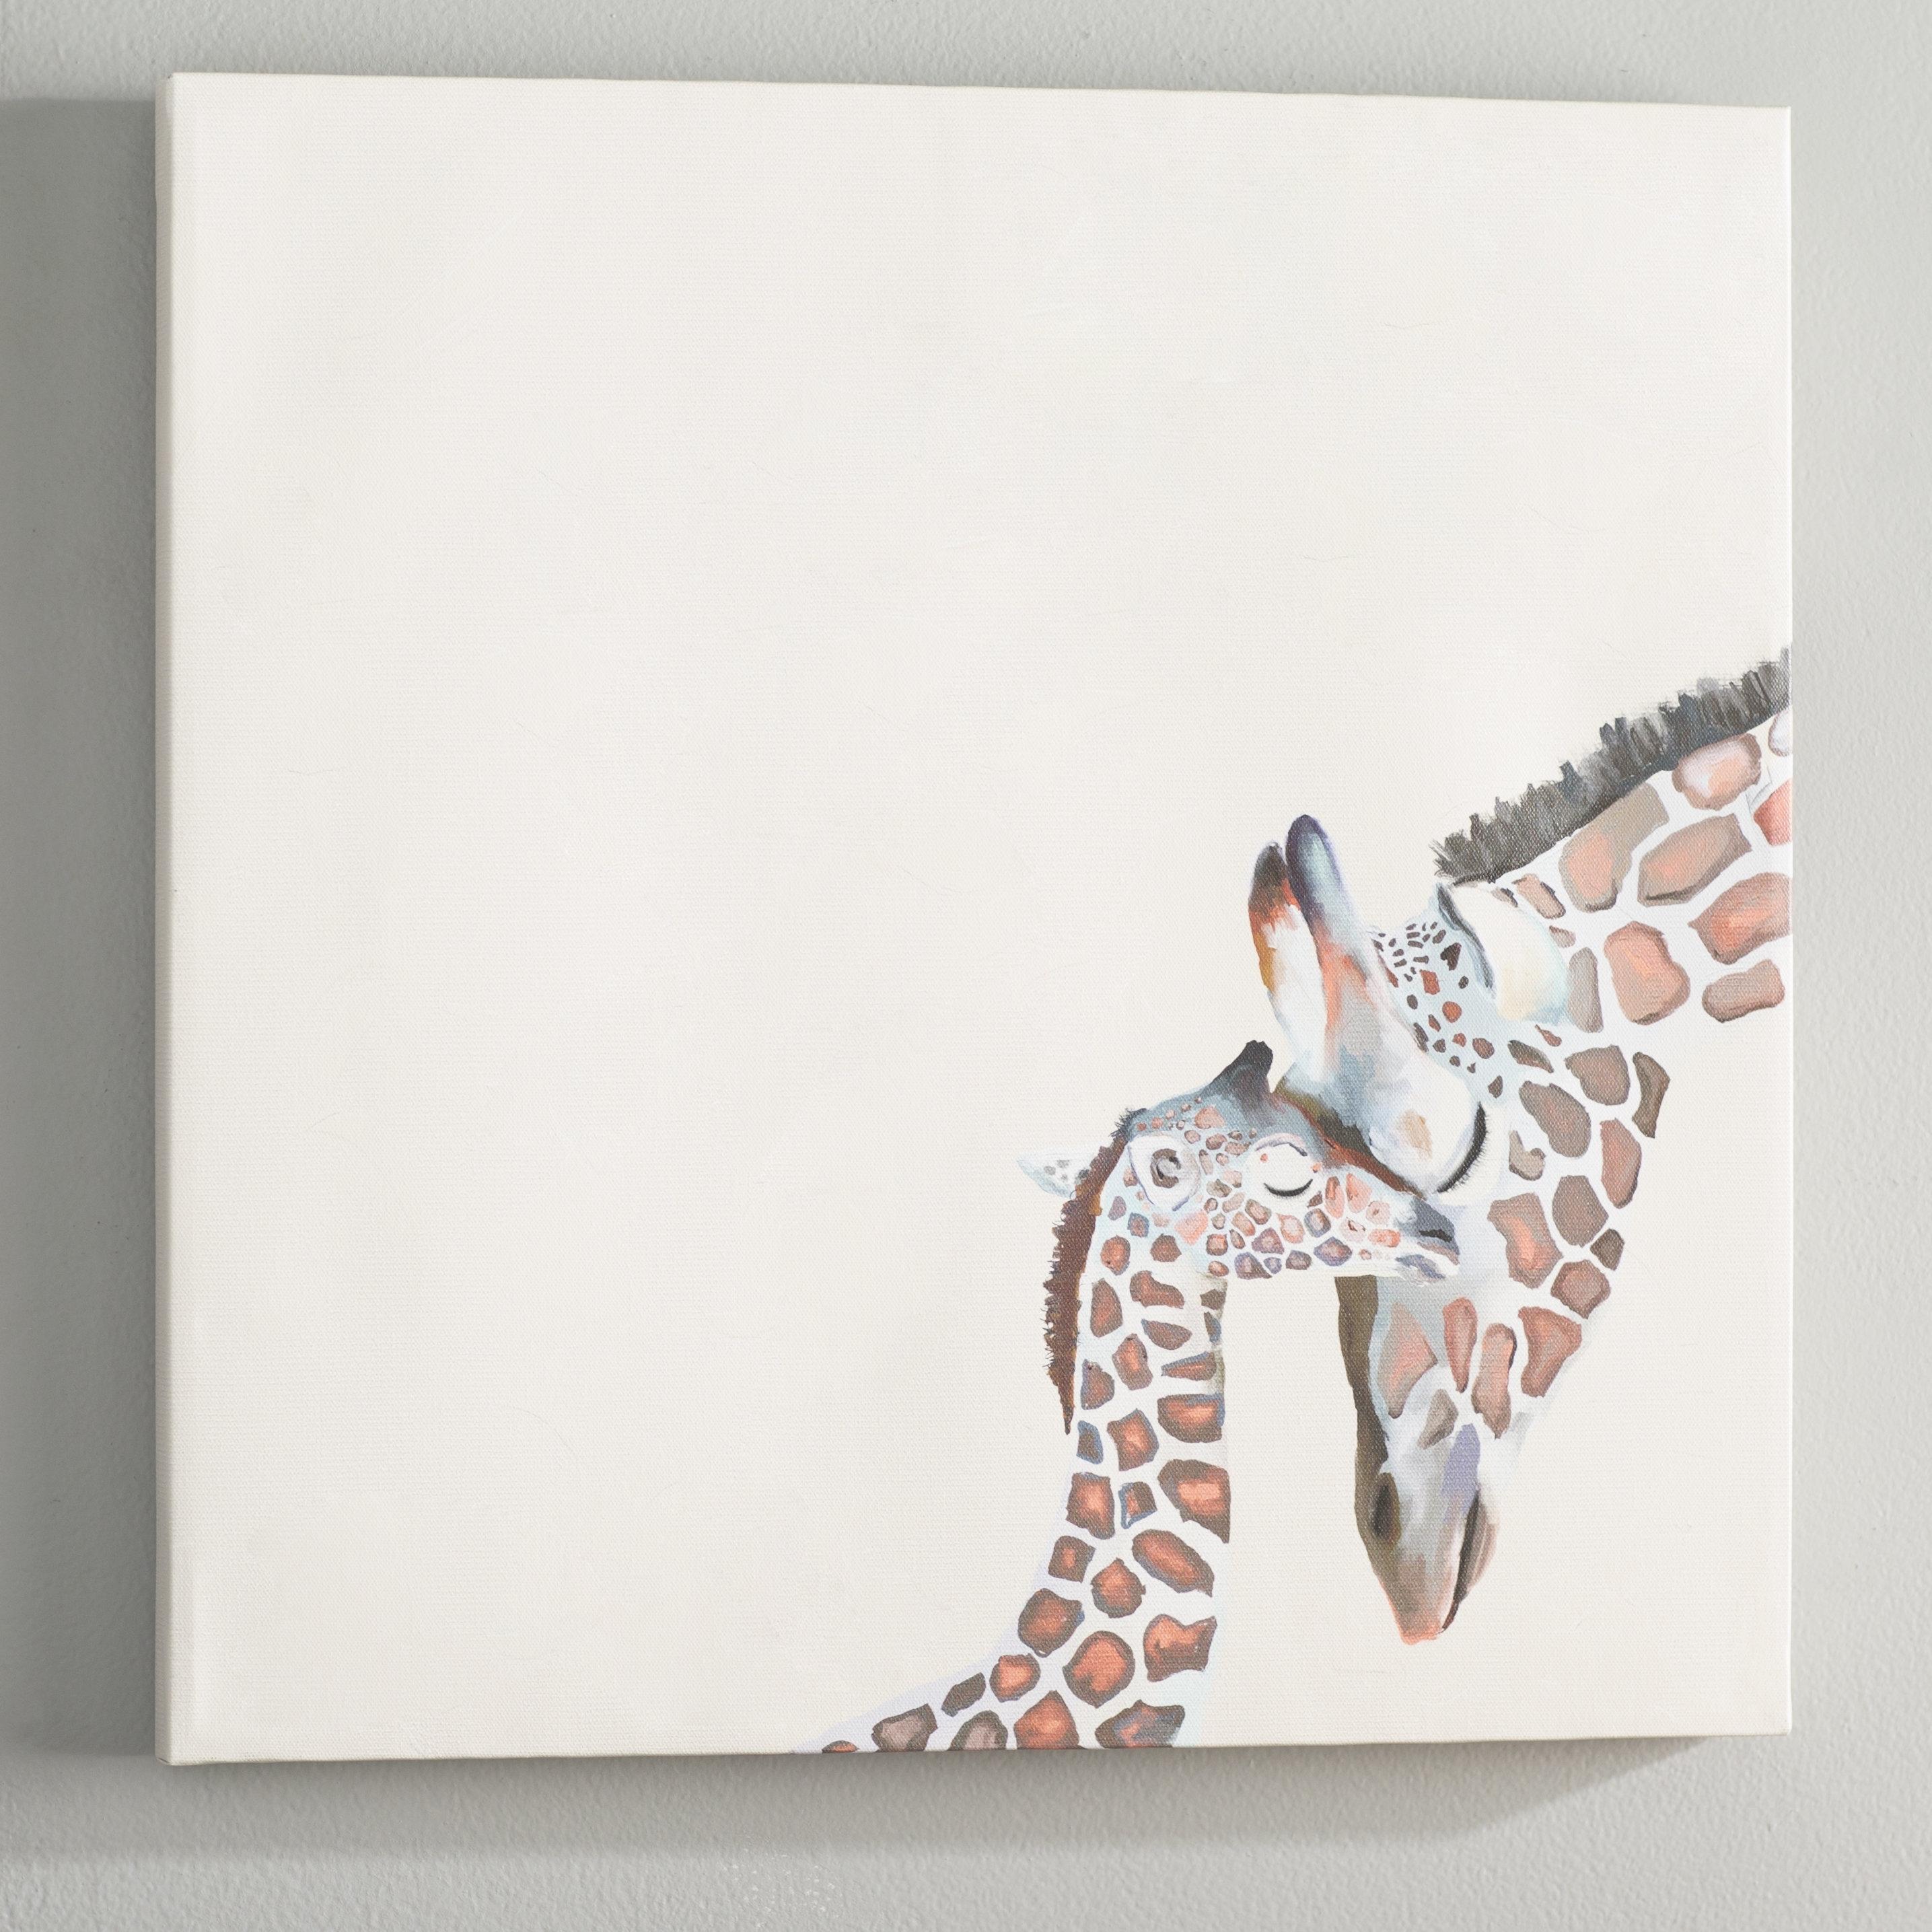 Viv + Rae Kris You And Me Giraffe Canvas Wall Art | Wayfair intended for Giraffe Canvas Wall Art (Image 20 of 20)